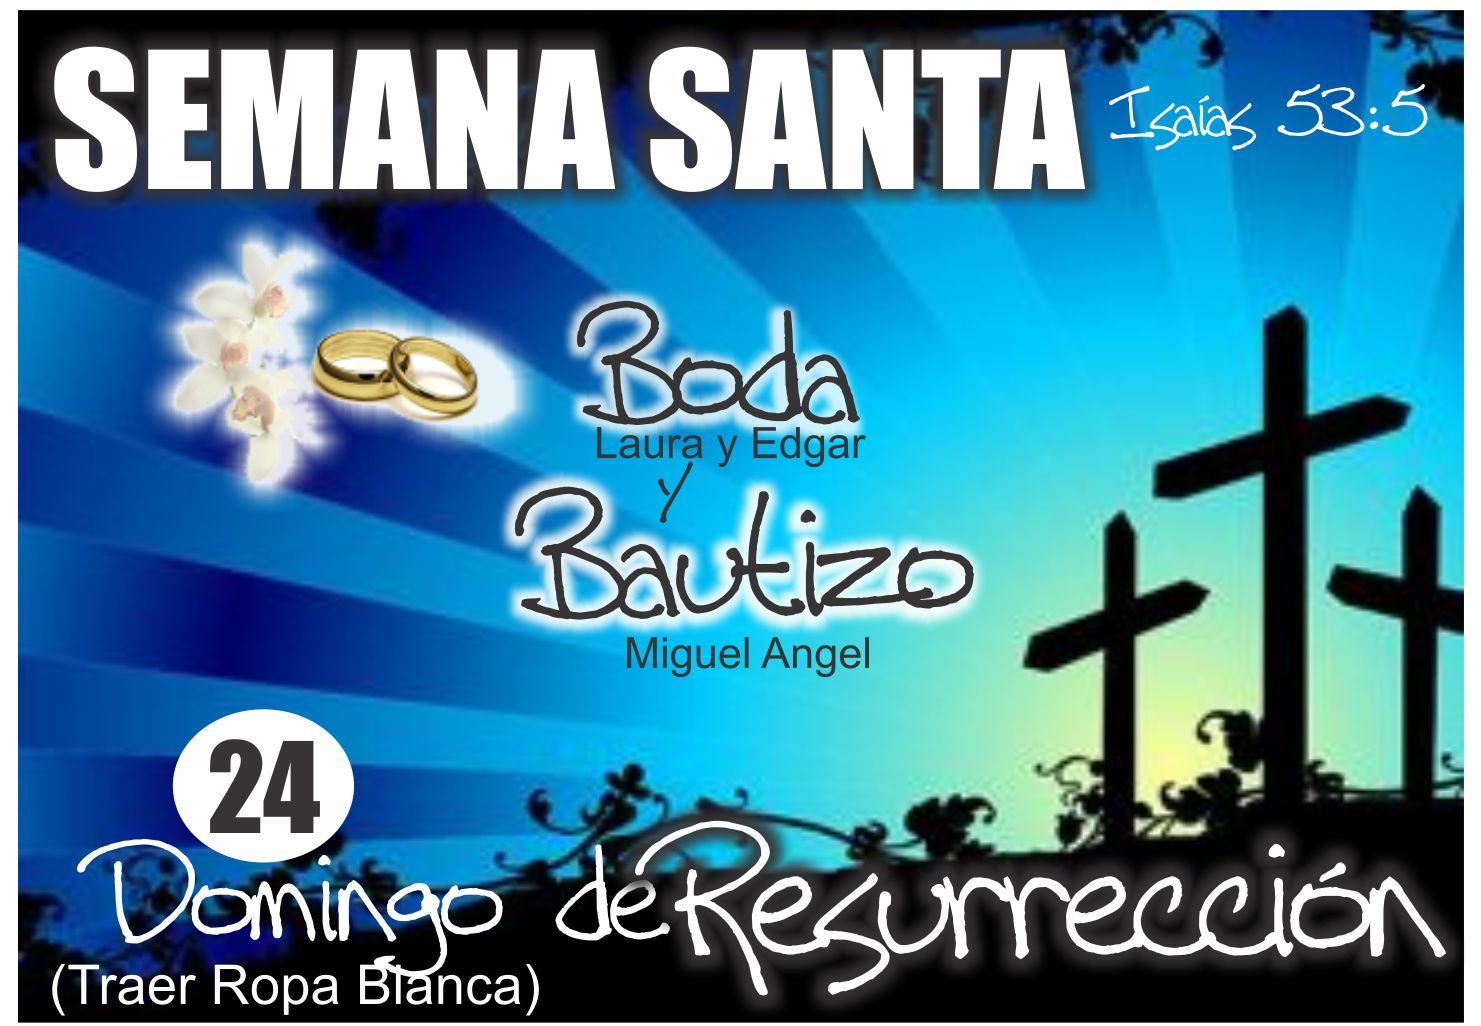 http://4.bp.blogspot.com/-8ziJlMwOlRg/TaECa6OyEMI/AAAAAAAAEf8/F18Tvr9KLX4/s1600-d/semana+santa4.jpg